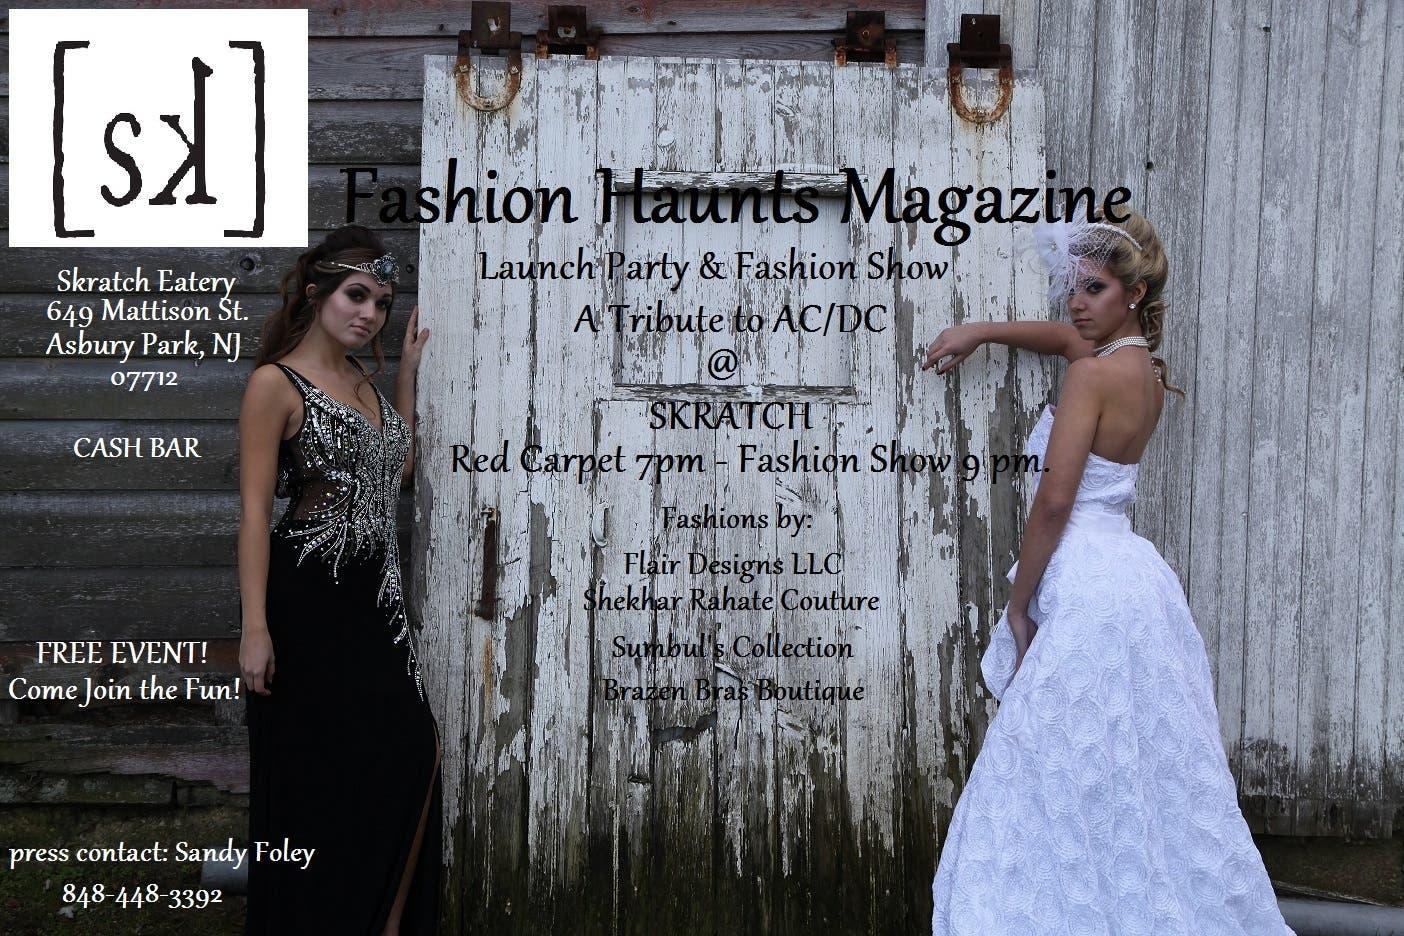 Fashion Haunts Magazine Launch Party & Fashion Show